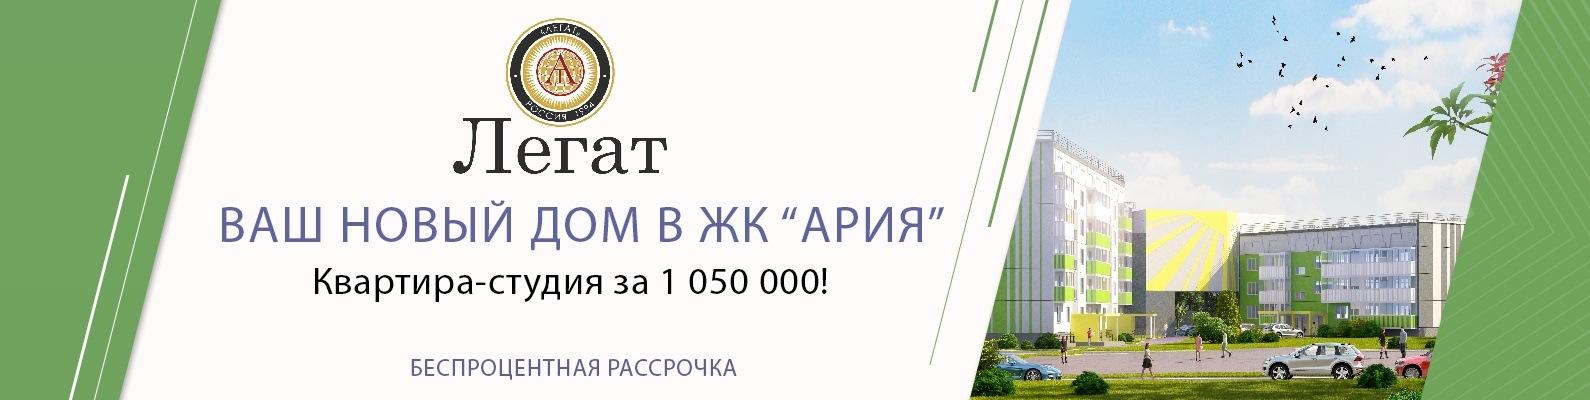 Фирменное шоу: что «Ария» приготовила для онлайн-концерта на РЕН ... | 400x1590